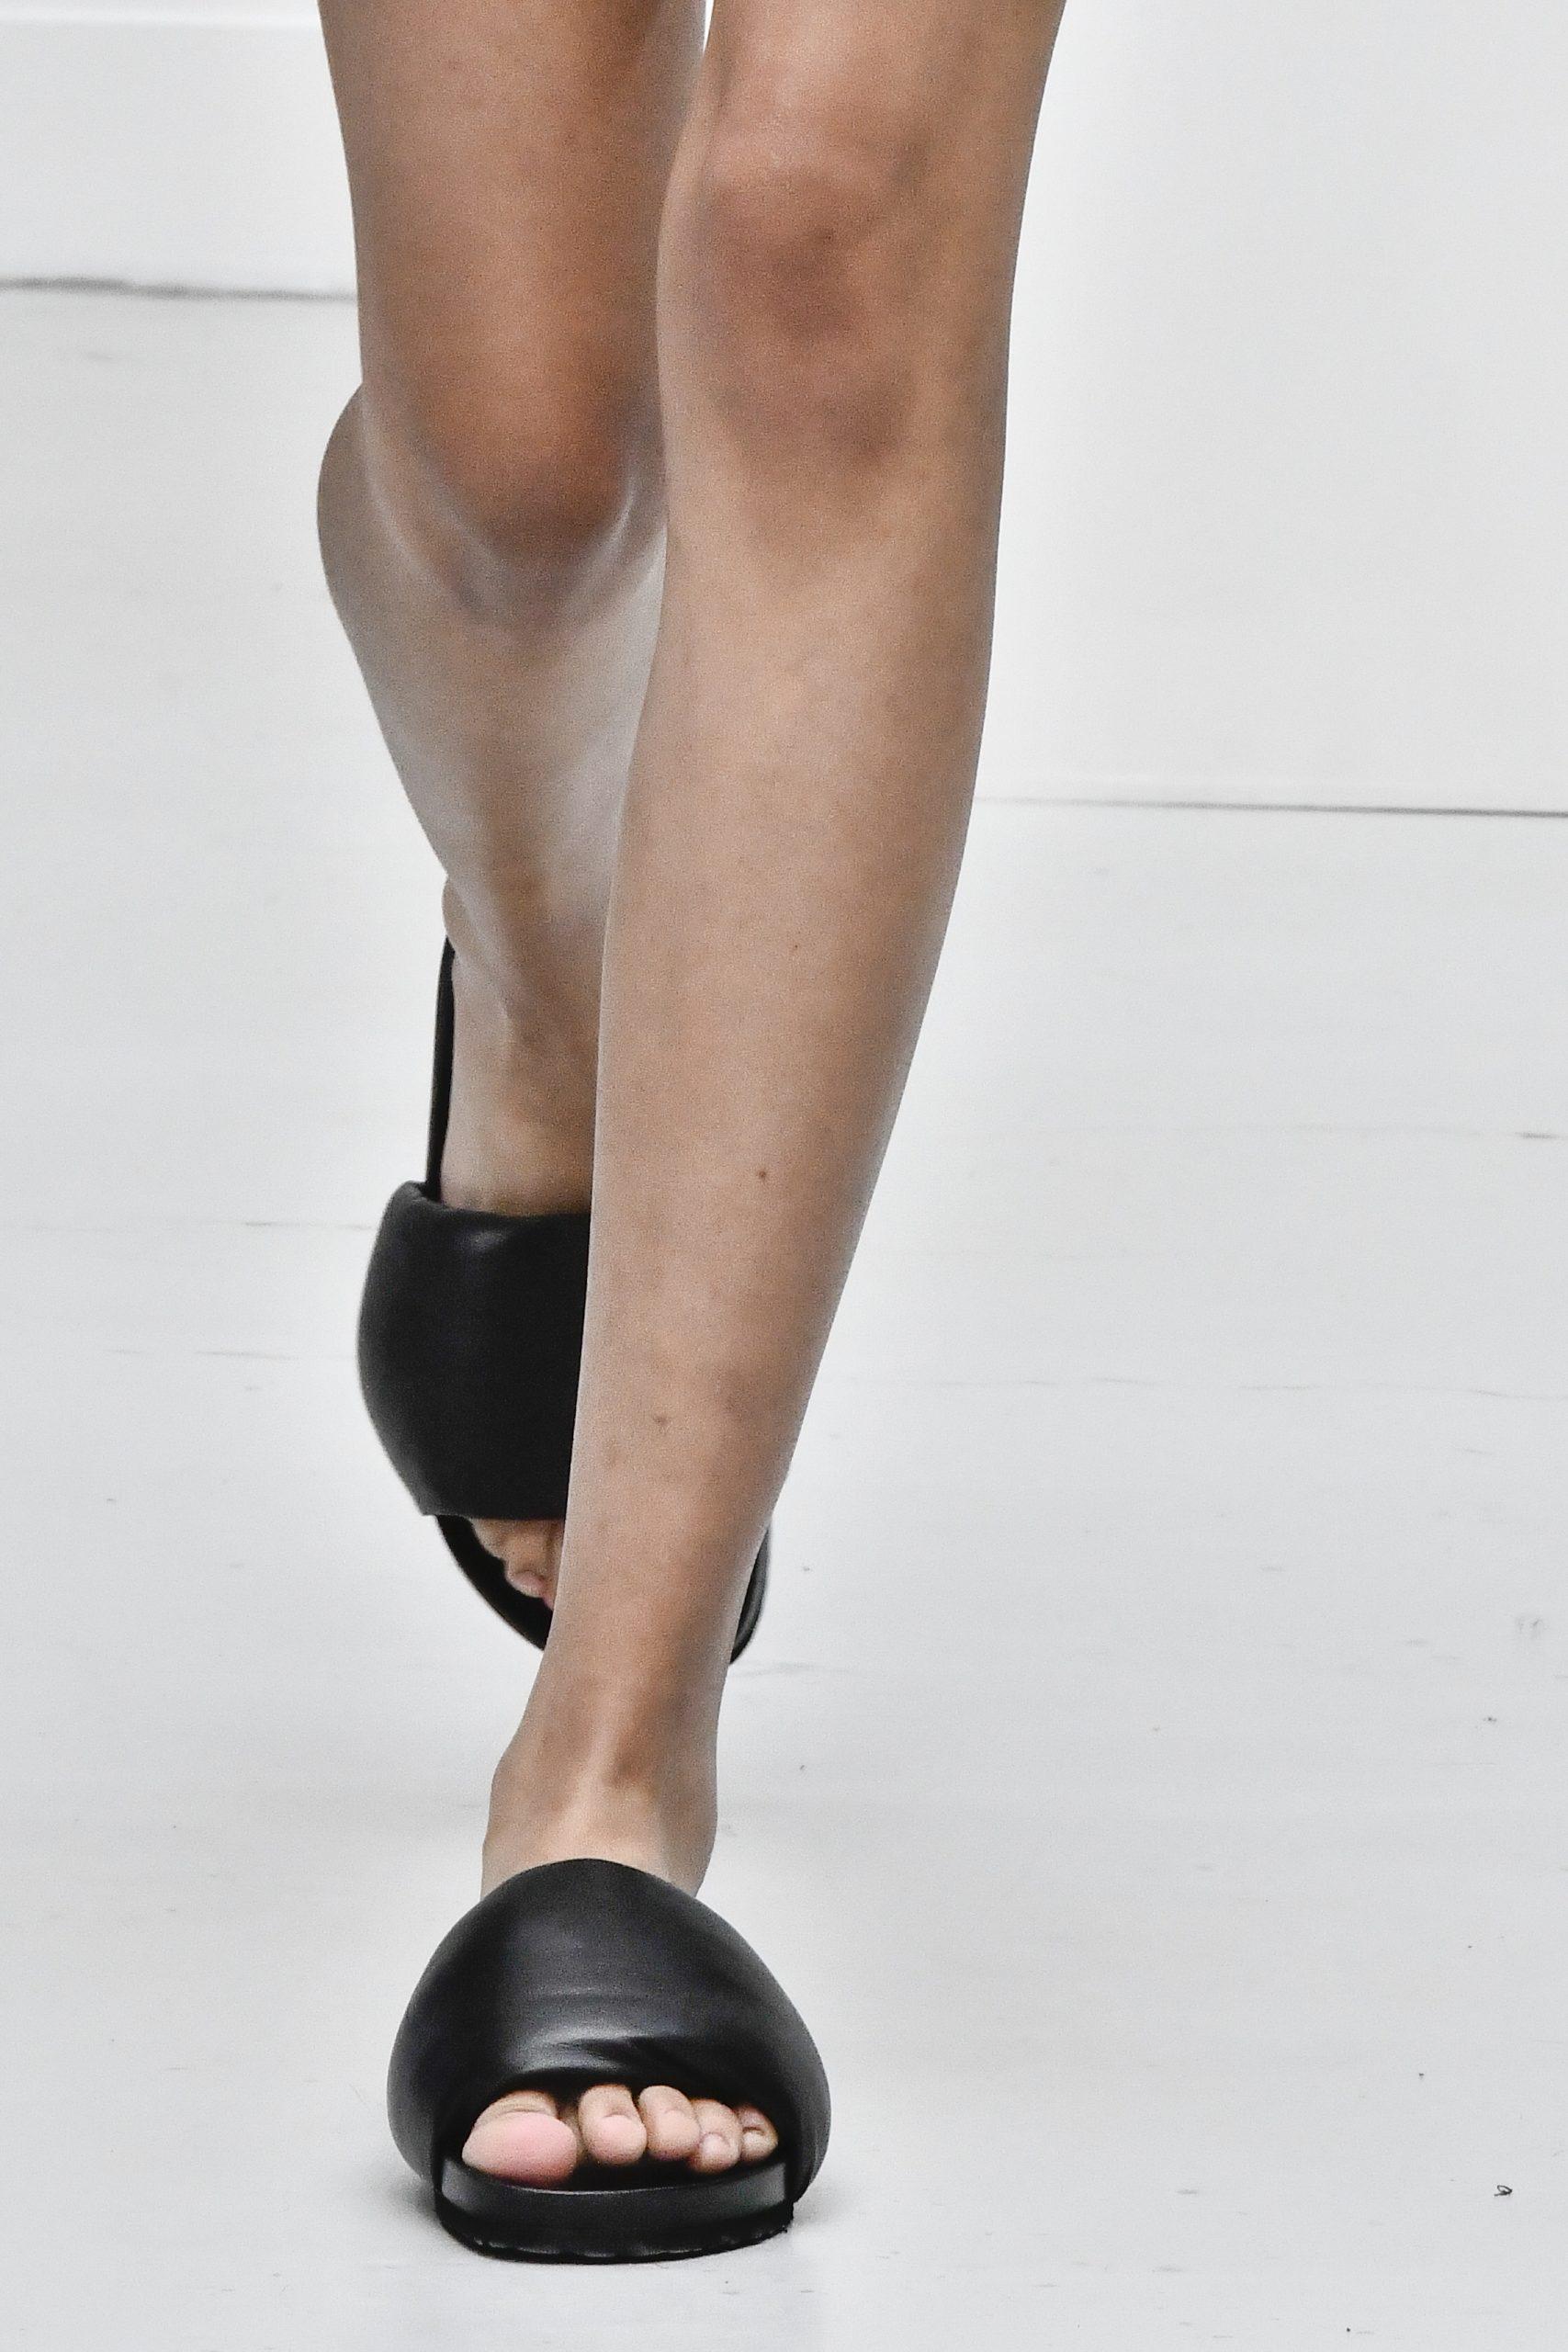 Shoe trends: Aυτά είναι τα flat παπούτσια που θα φορέσουμε την Άνοιξη και το Καλοκαίρι